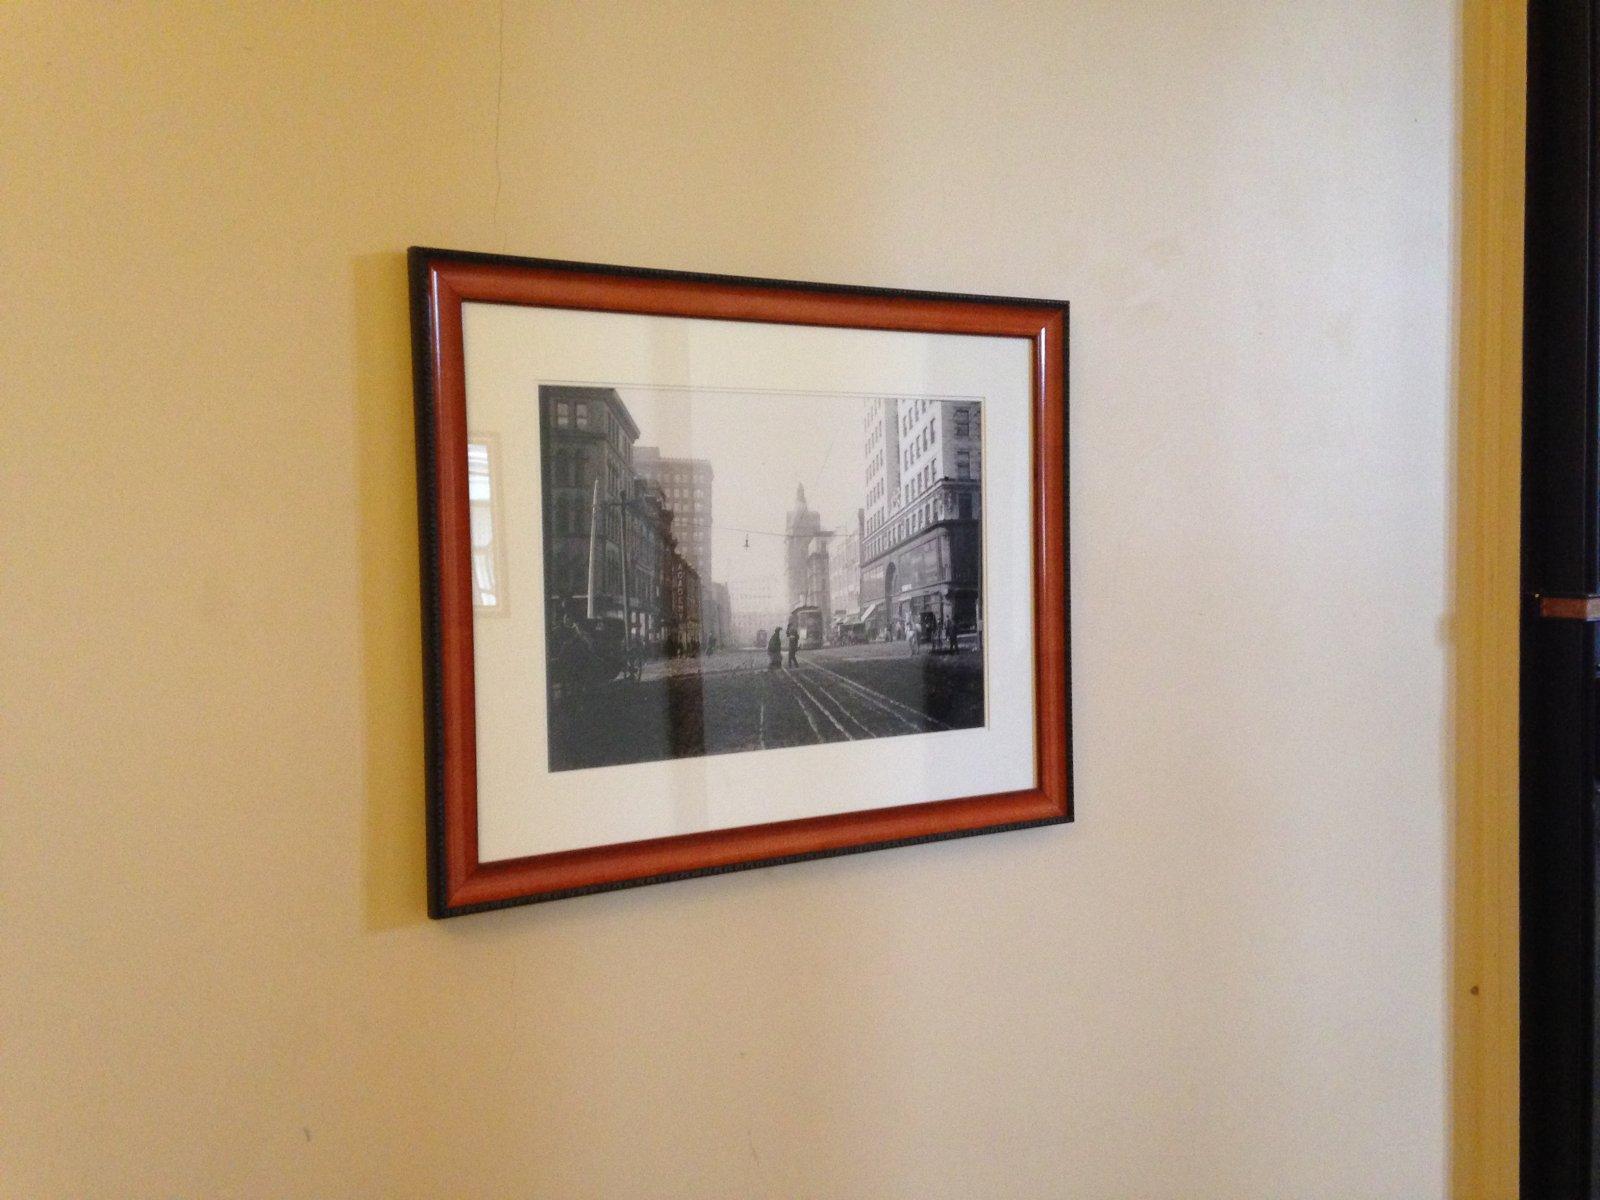 Streetcar photo in the lobby.